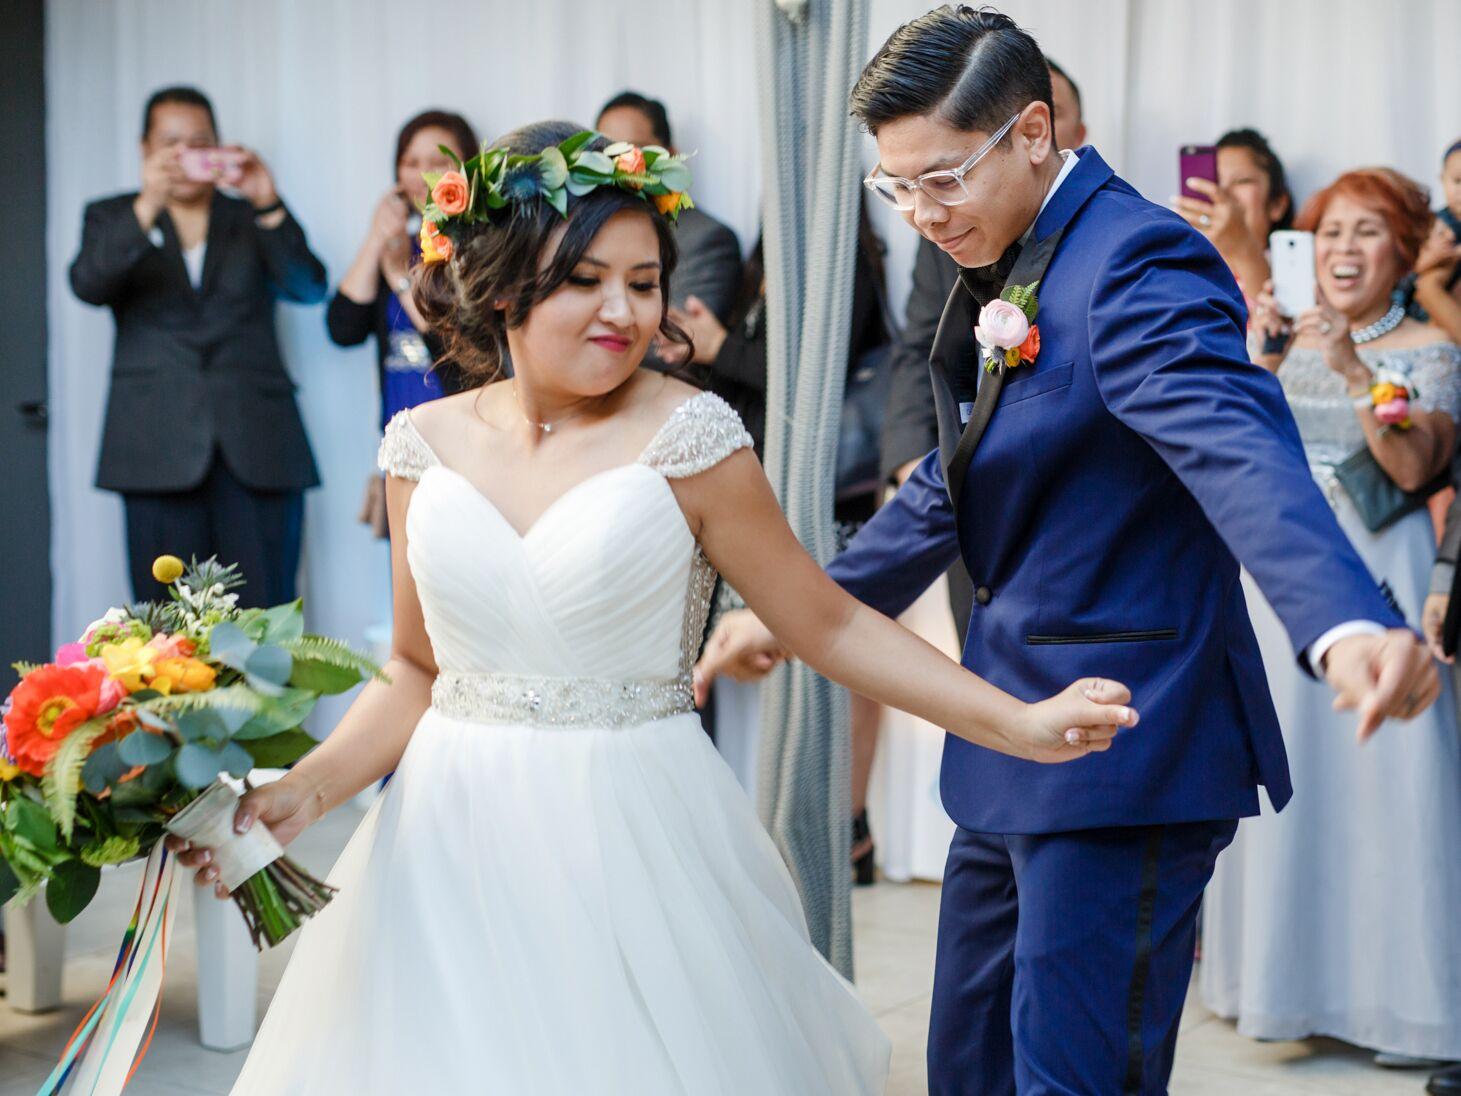 100 Wedding Entrance Songs